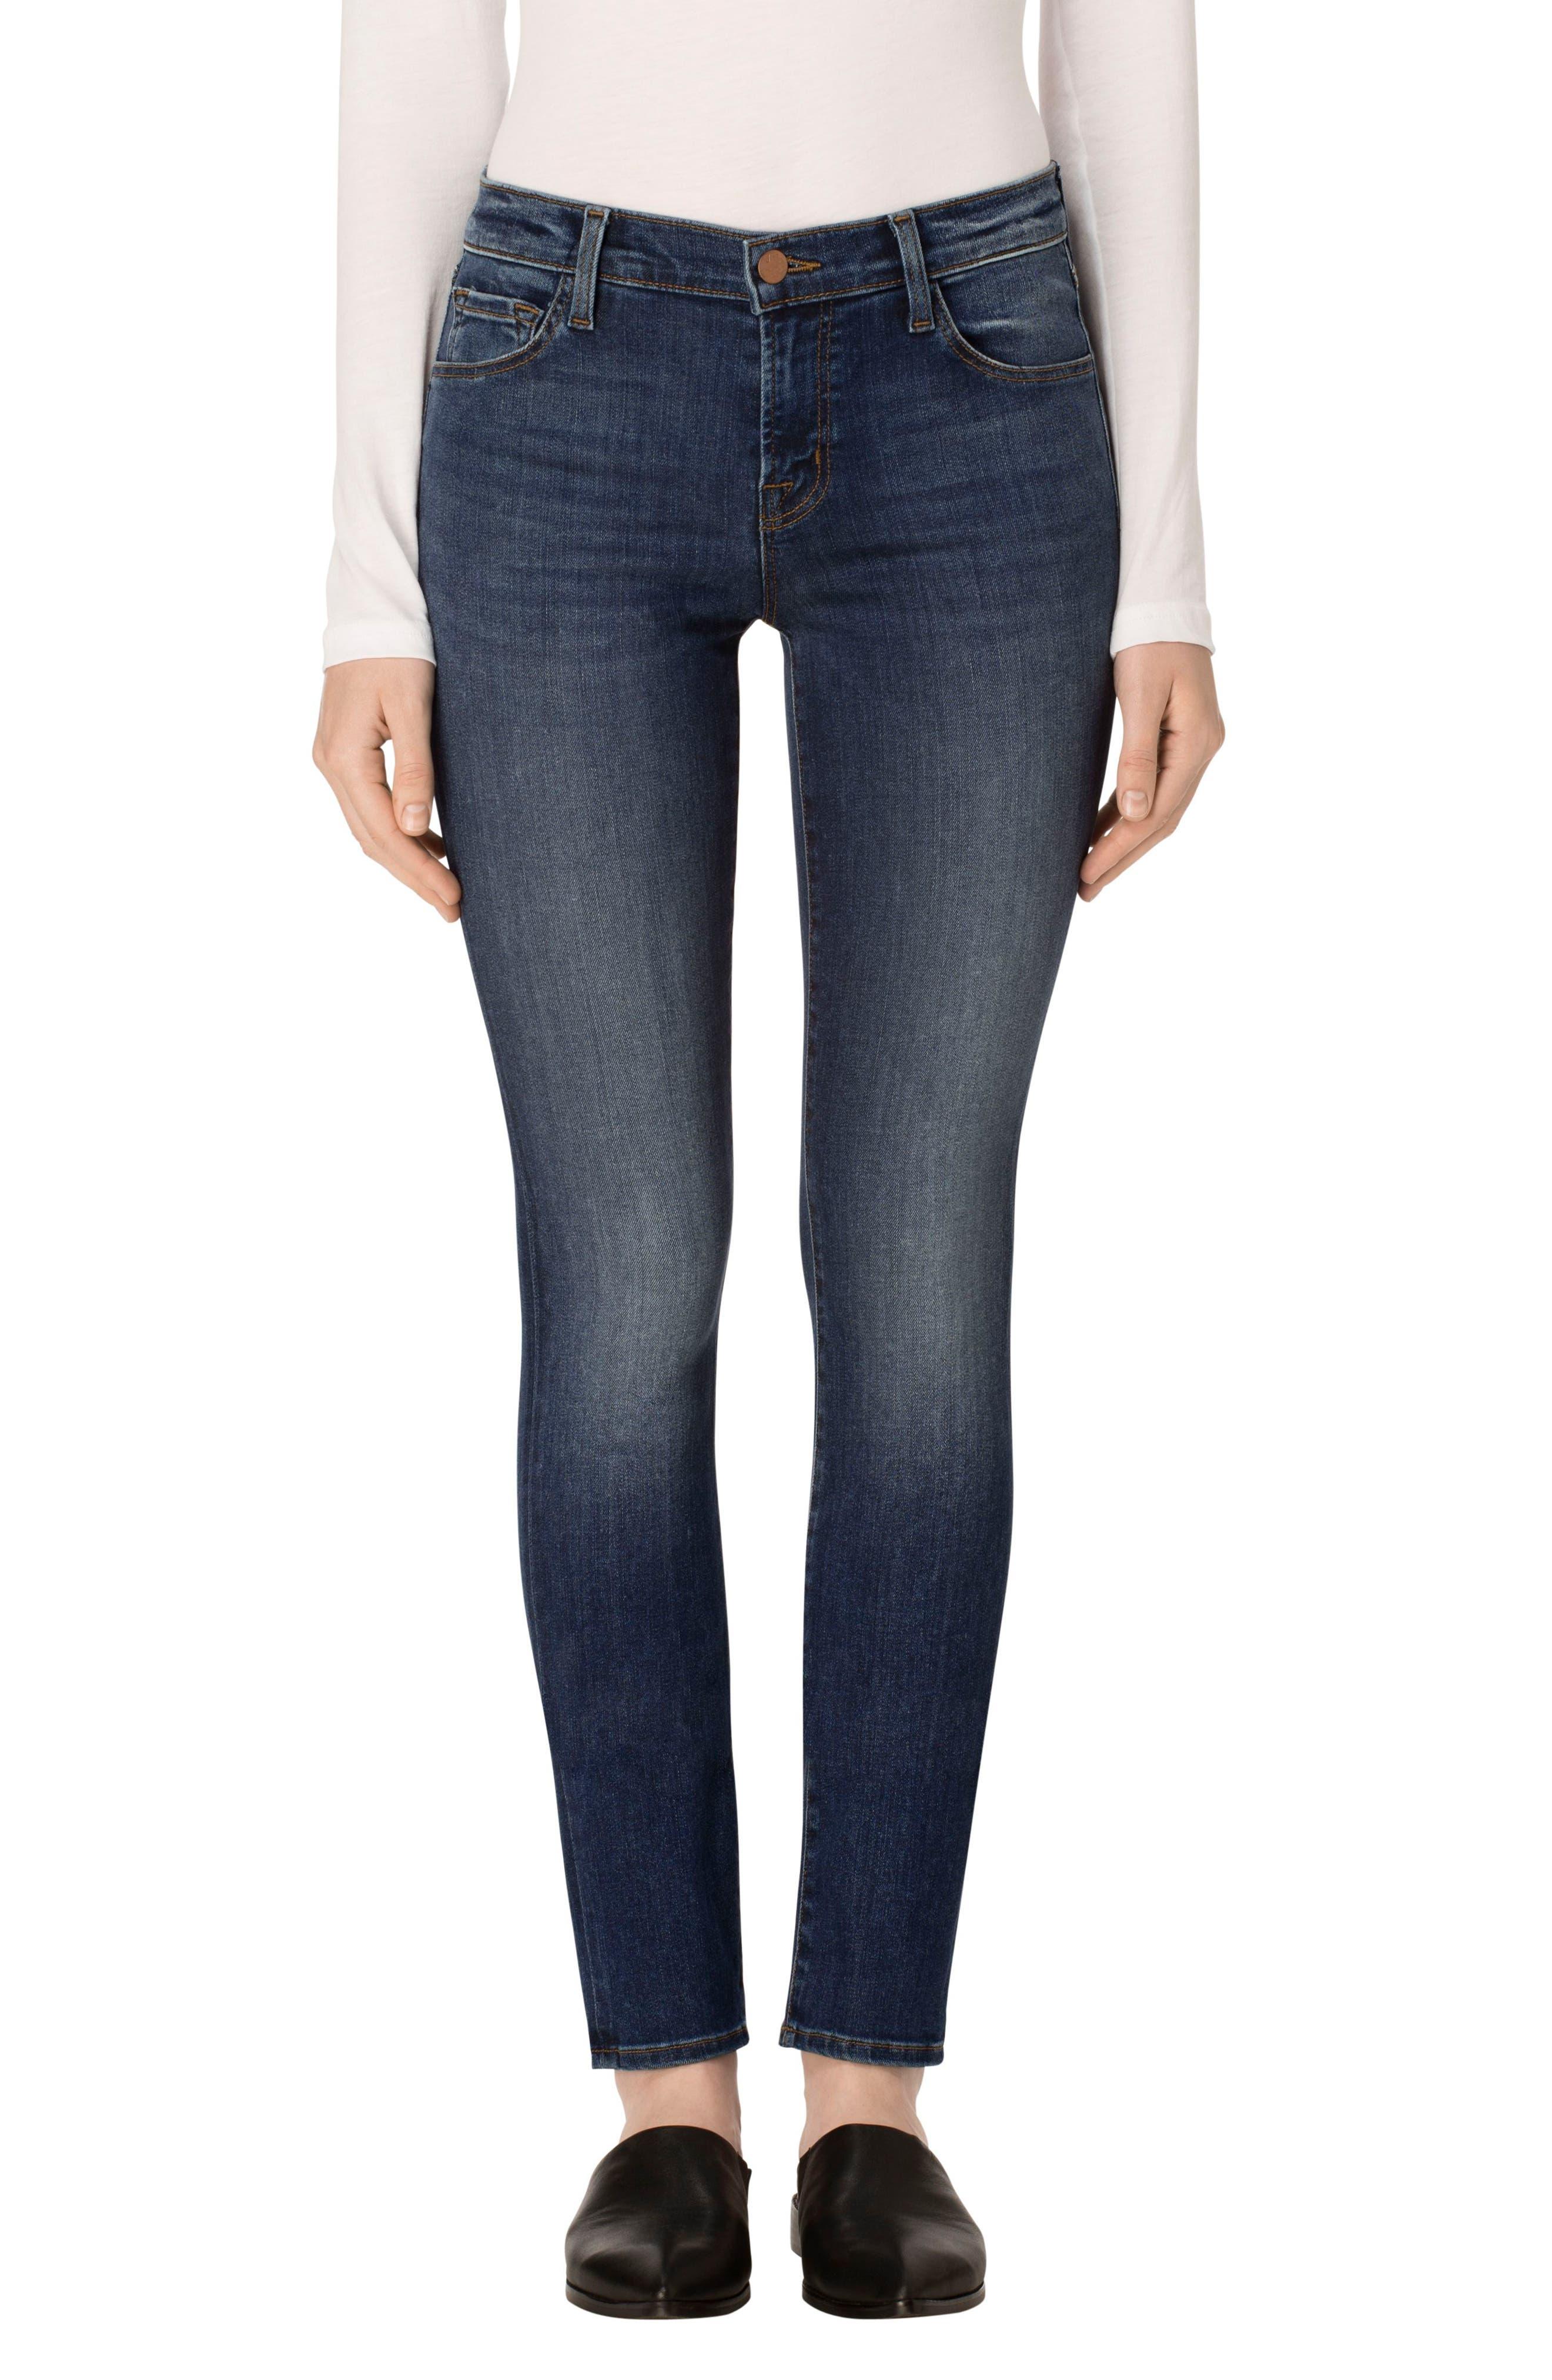 J Brand Mid Rise Super Skinny Jeans (Surrey Lane)